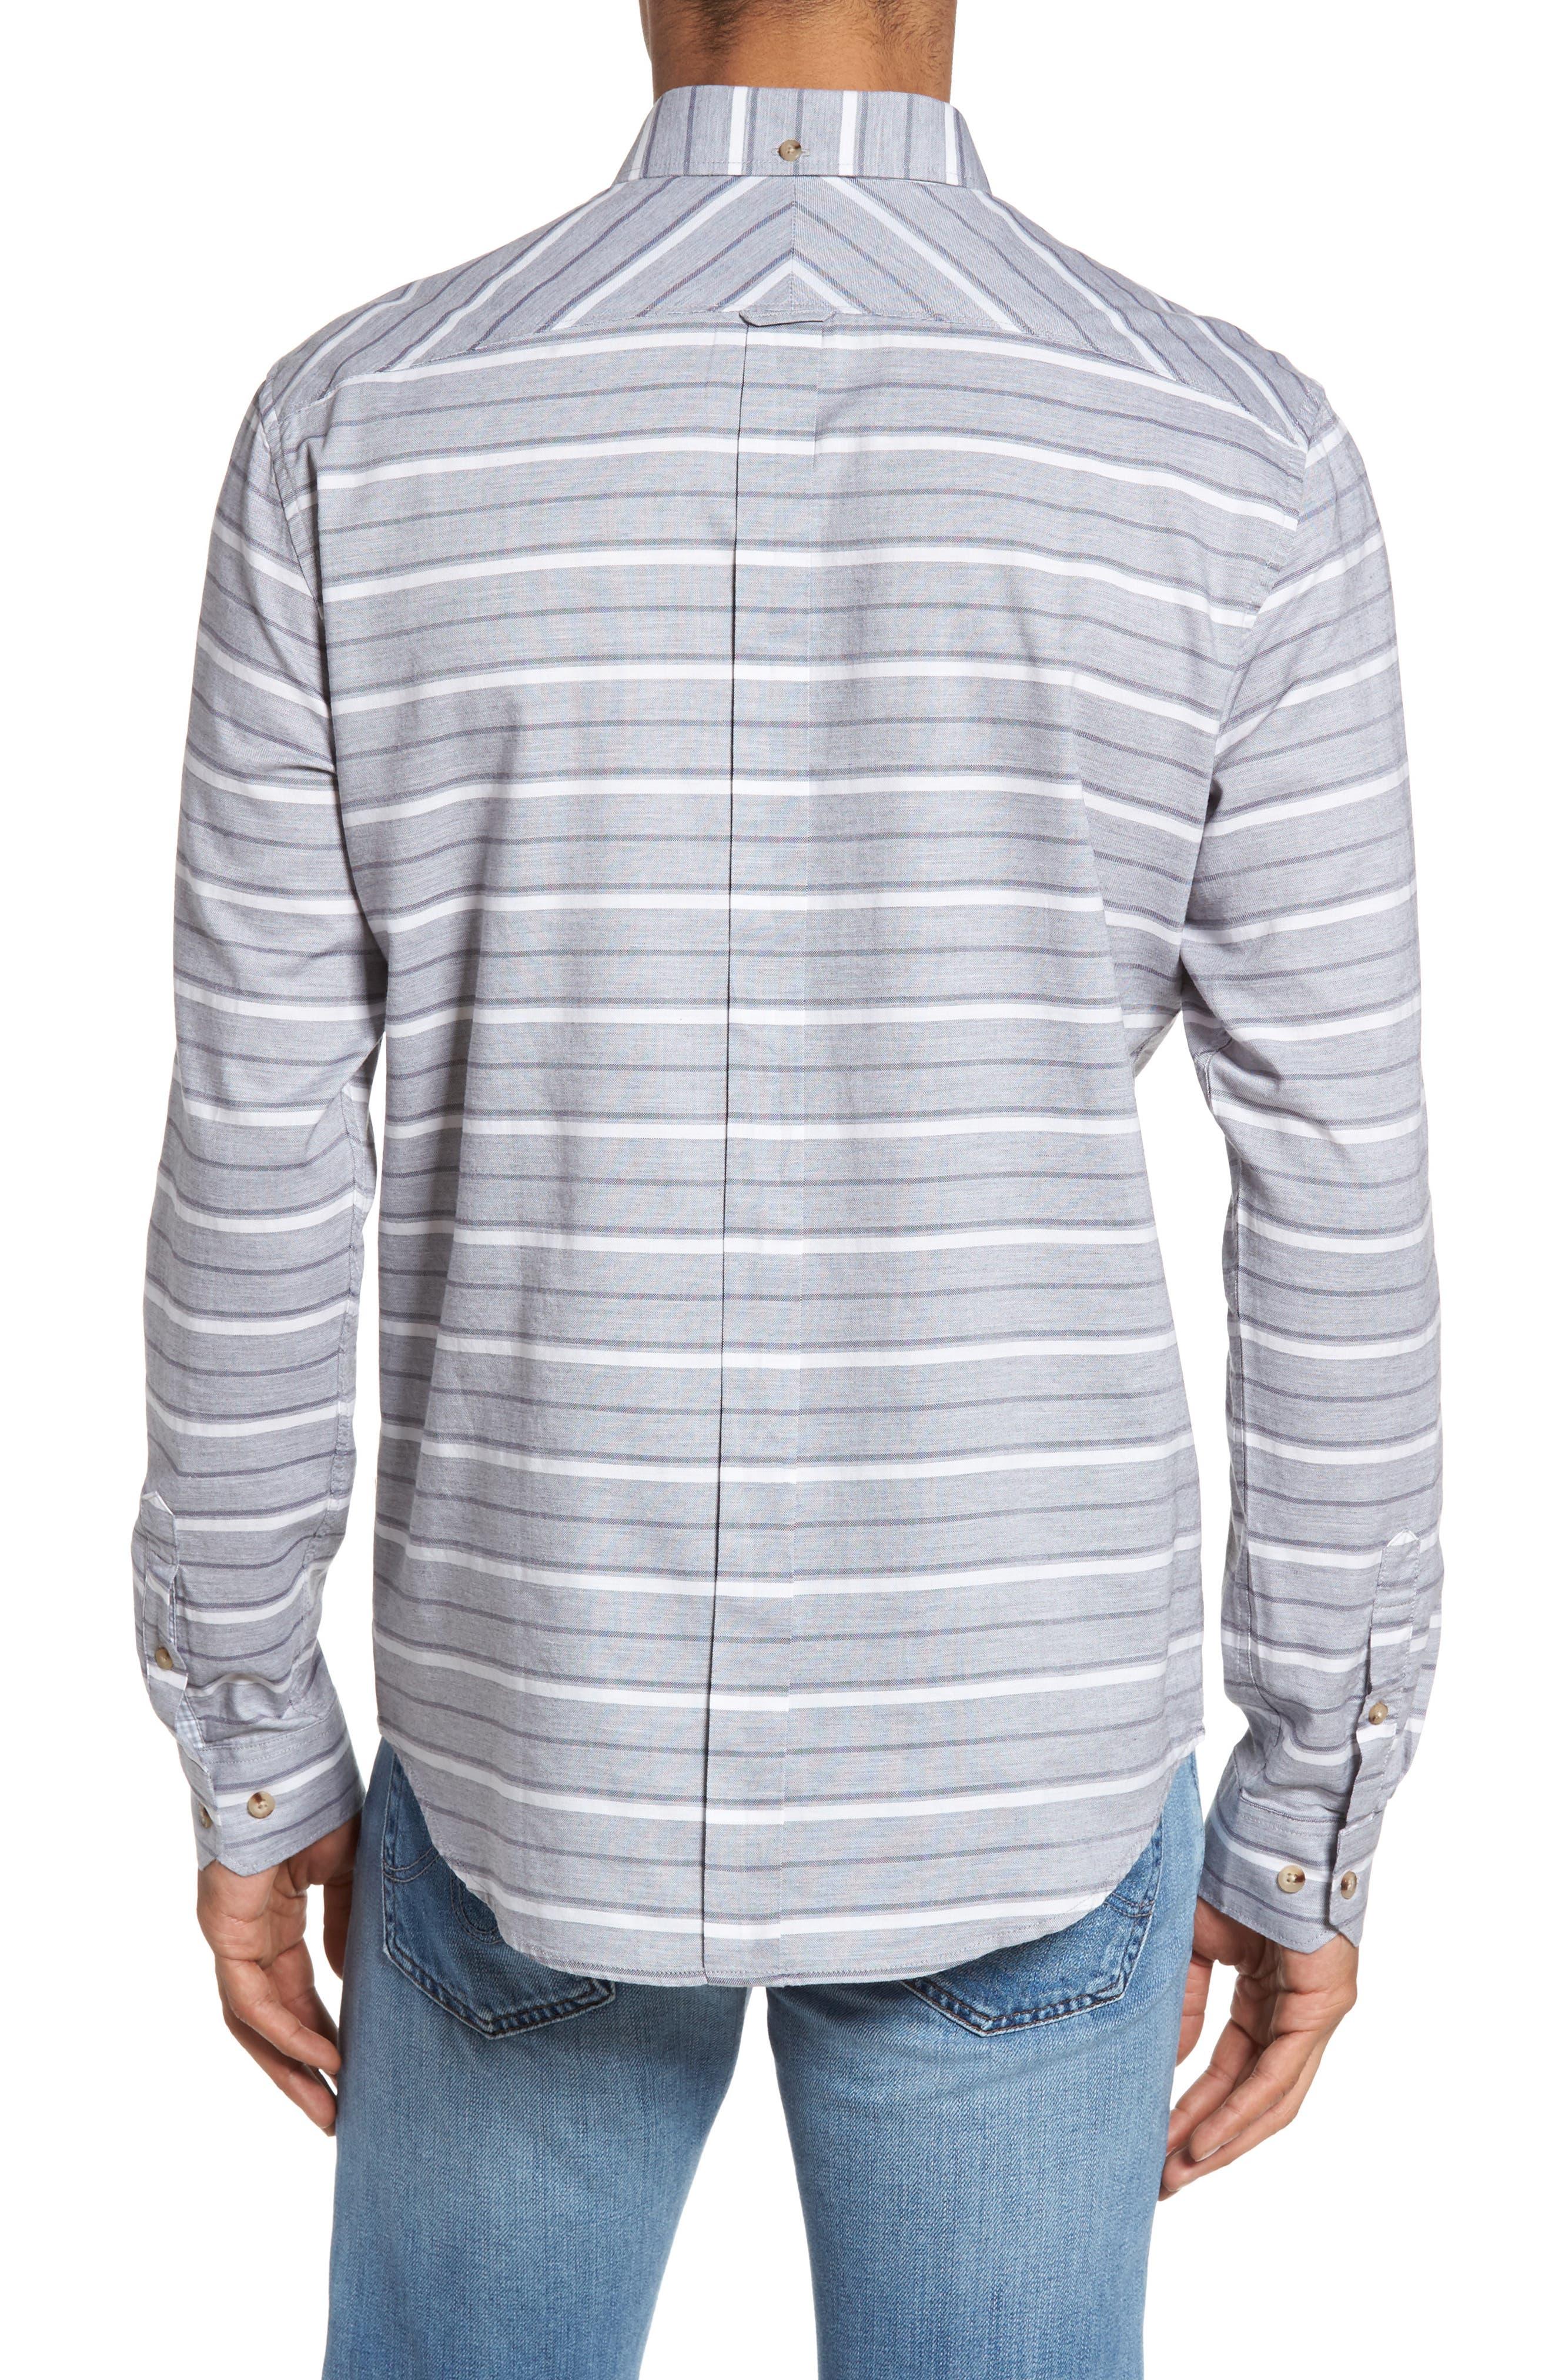 Tipping Horizontal Stripe Shirt,                             Alternate thumbnail 2, color,                             020